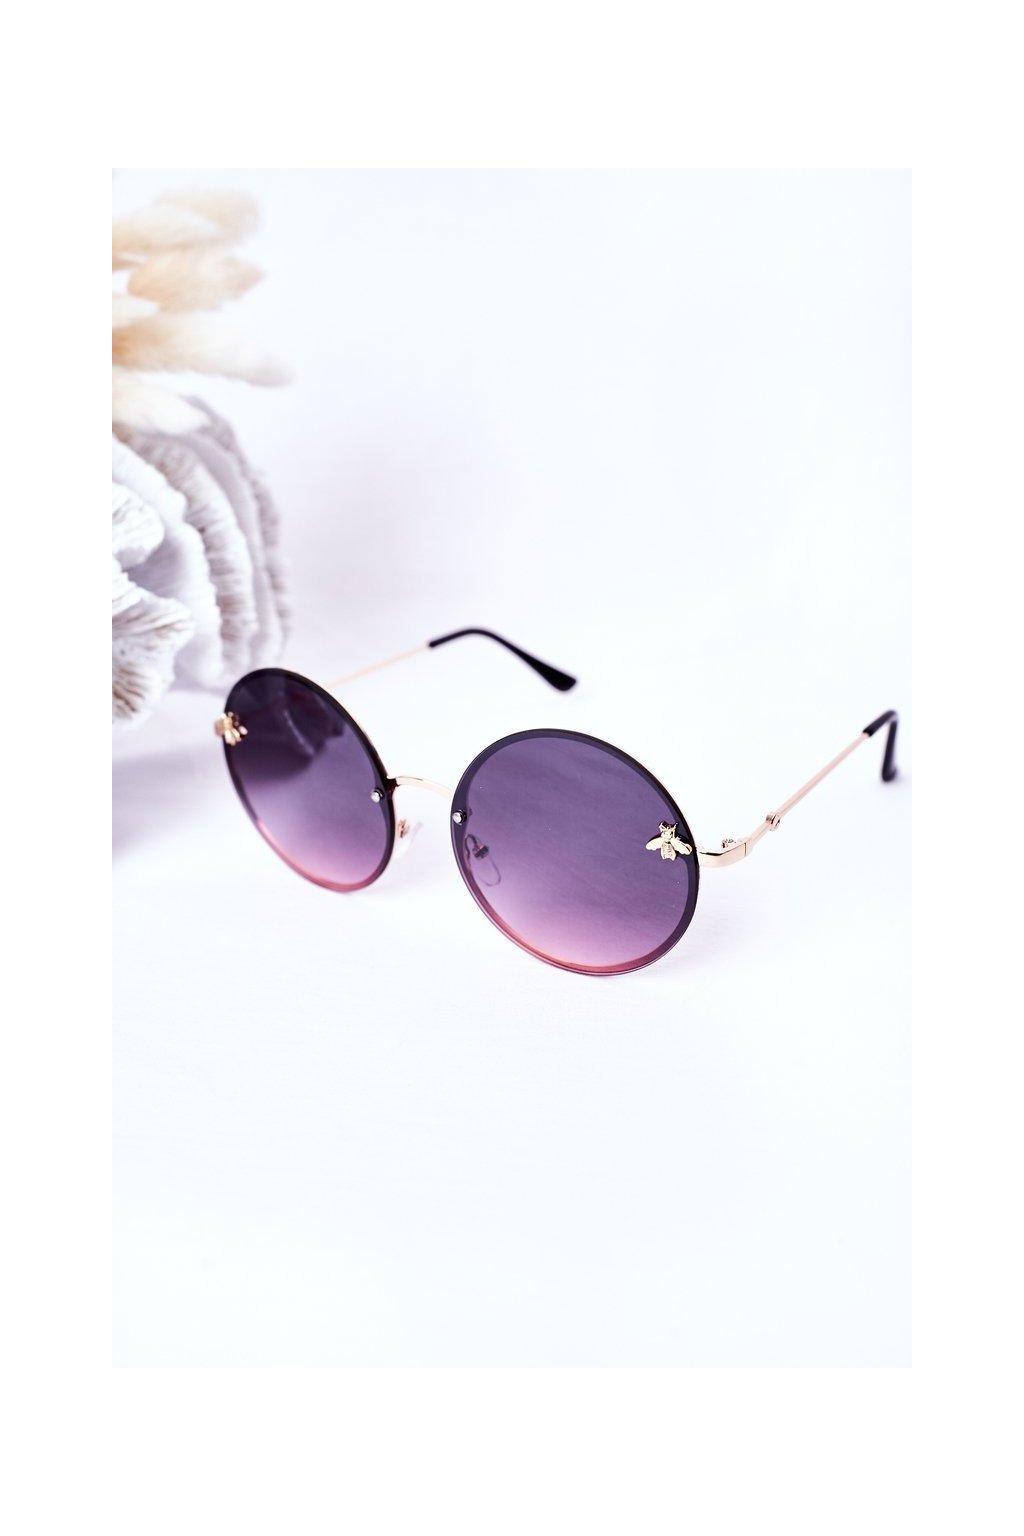 Módne slnečné okuliare ružové VINSENT VINSENT005 PINK